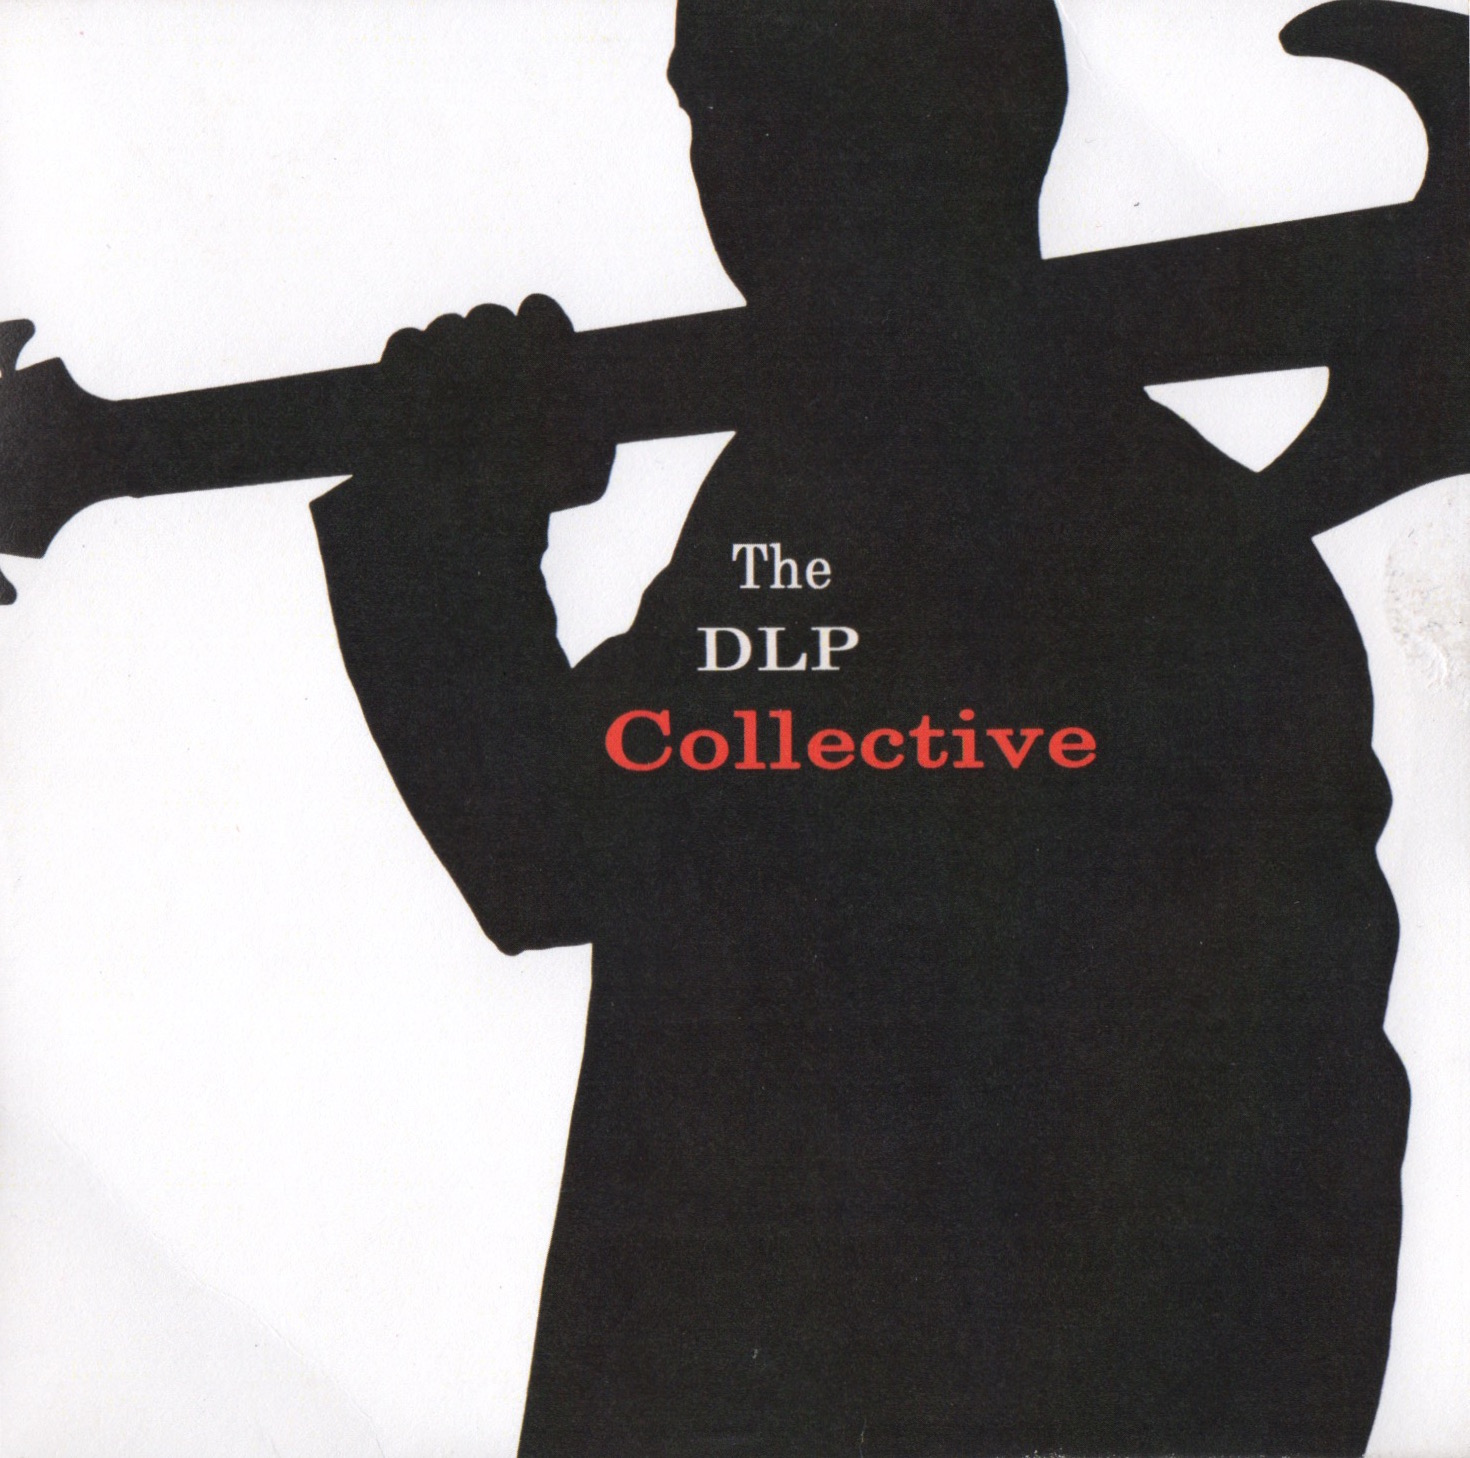 DLP Collective front.jpeg